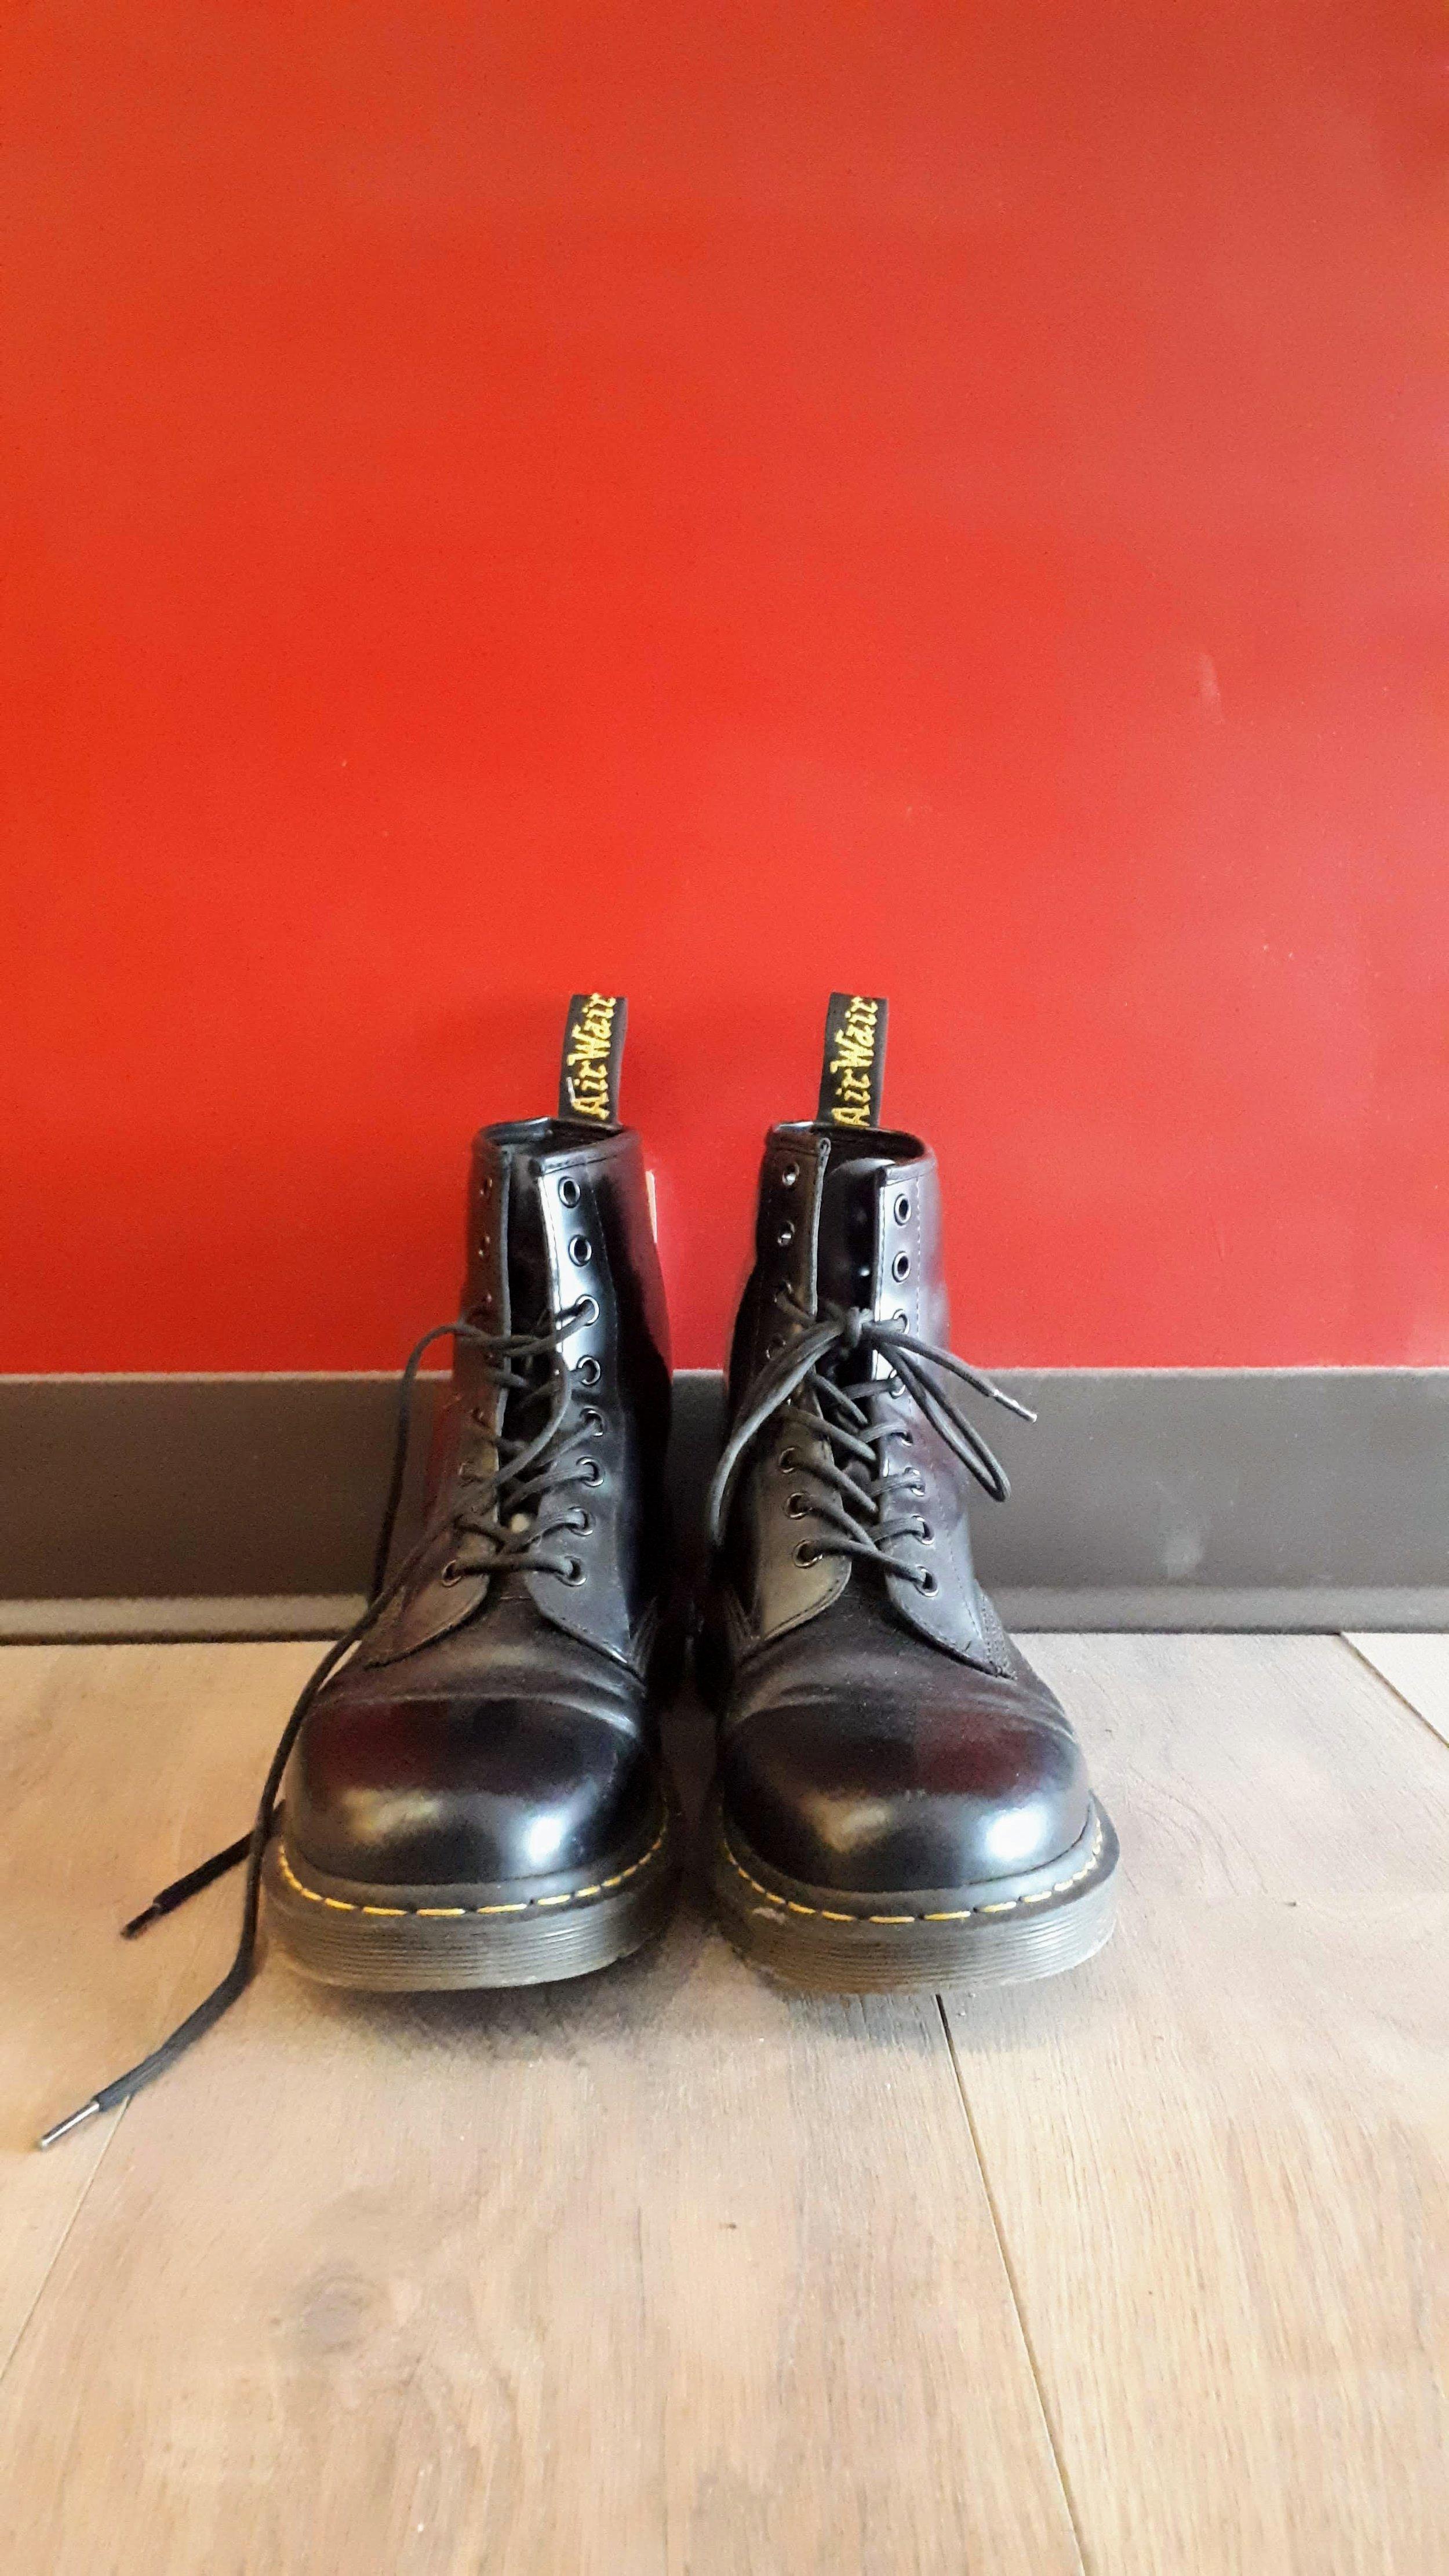 Doc Martens boots; Mens size 10, $85